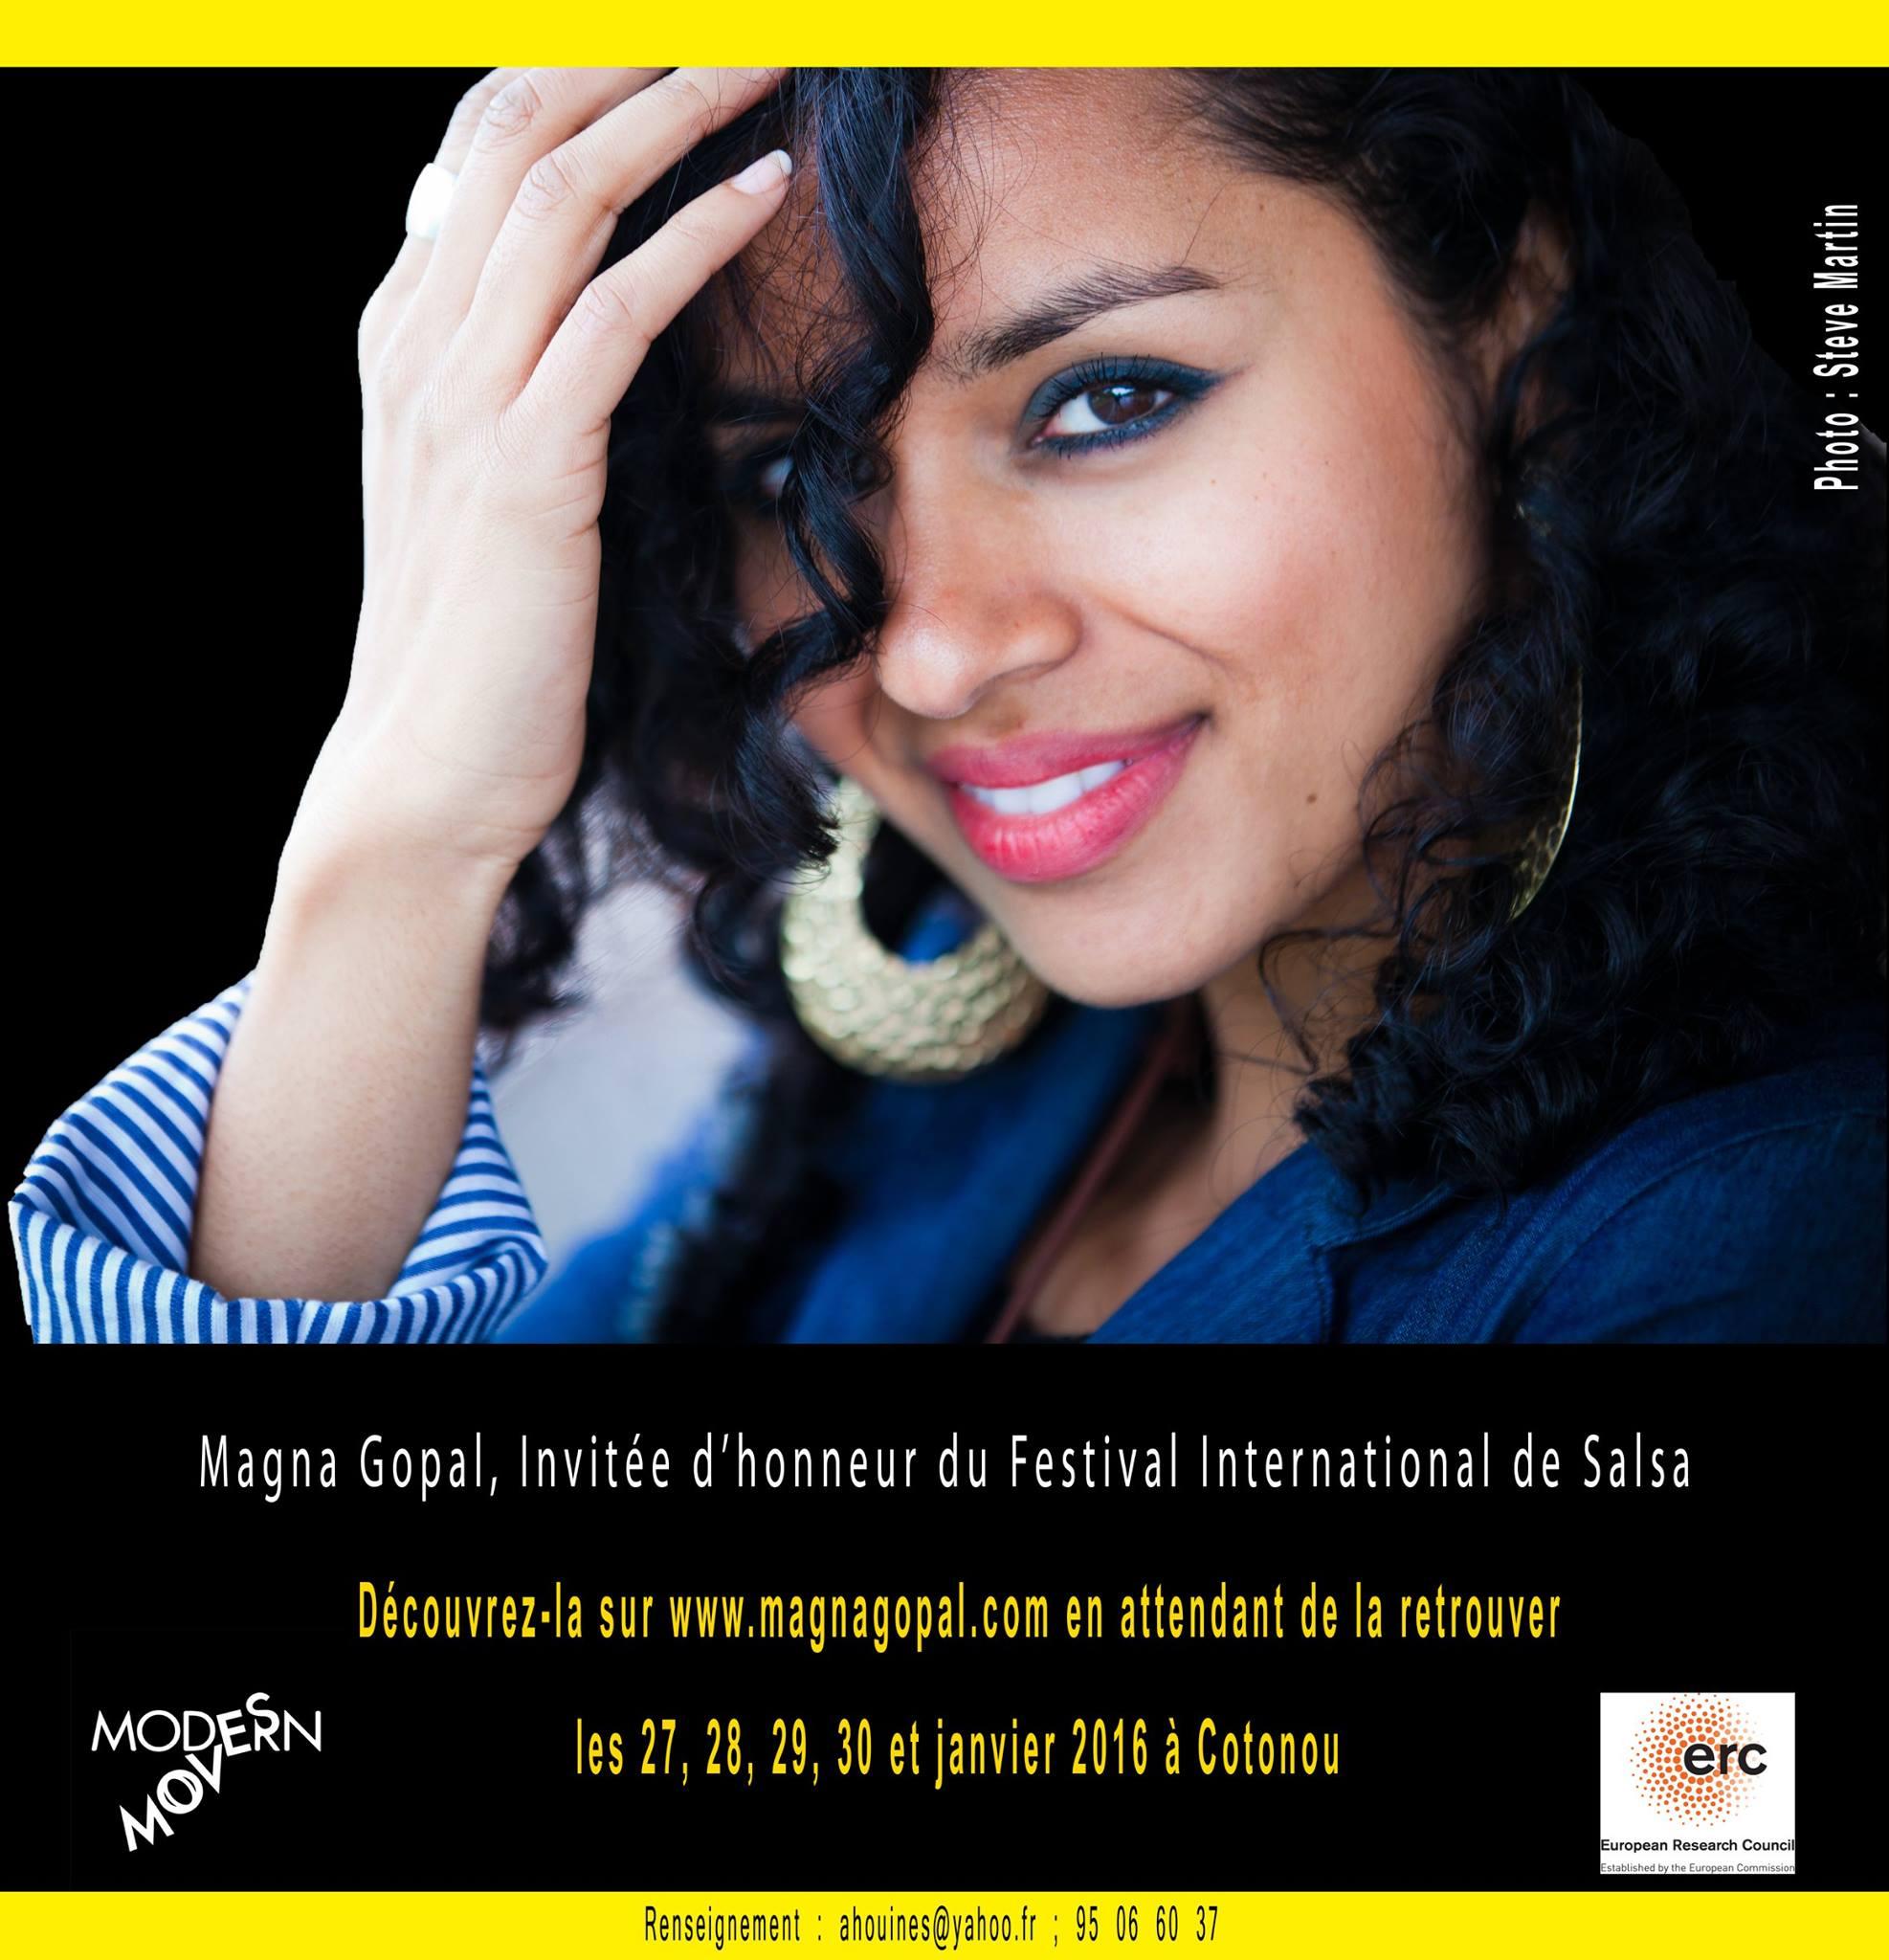 The International Salsa Festival announces Magna Gopal's participation